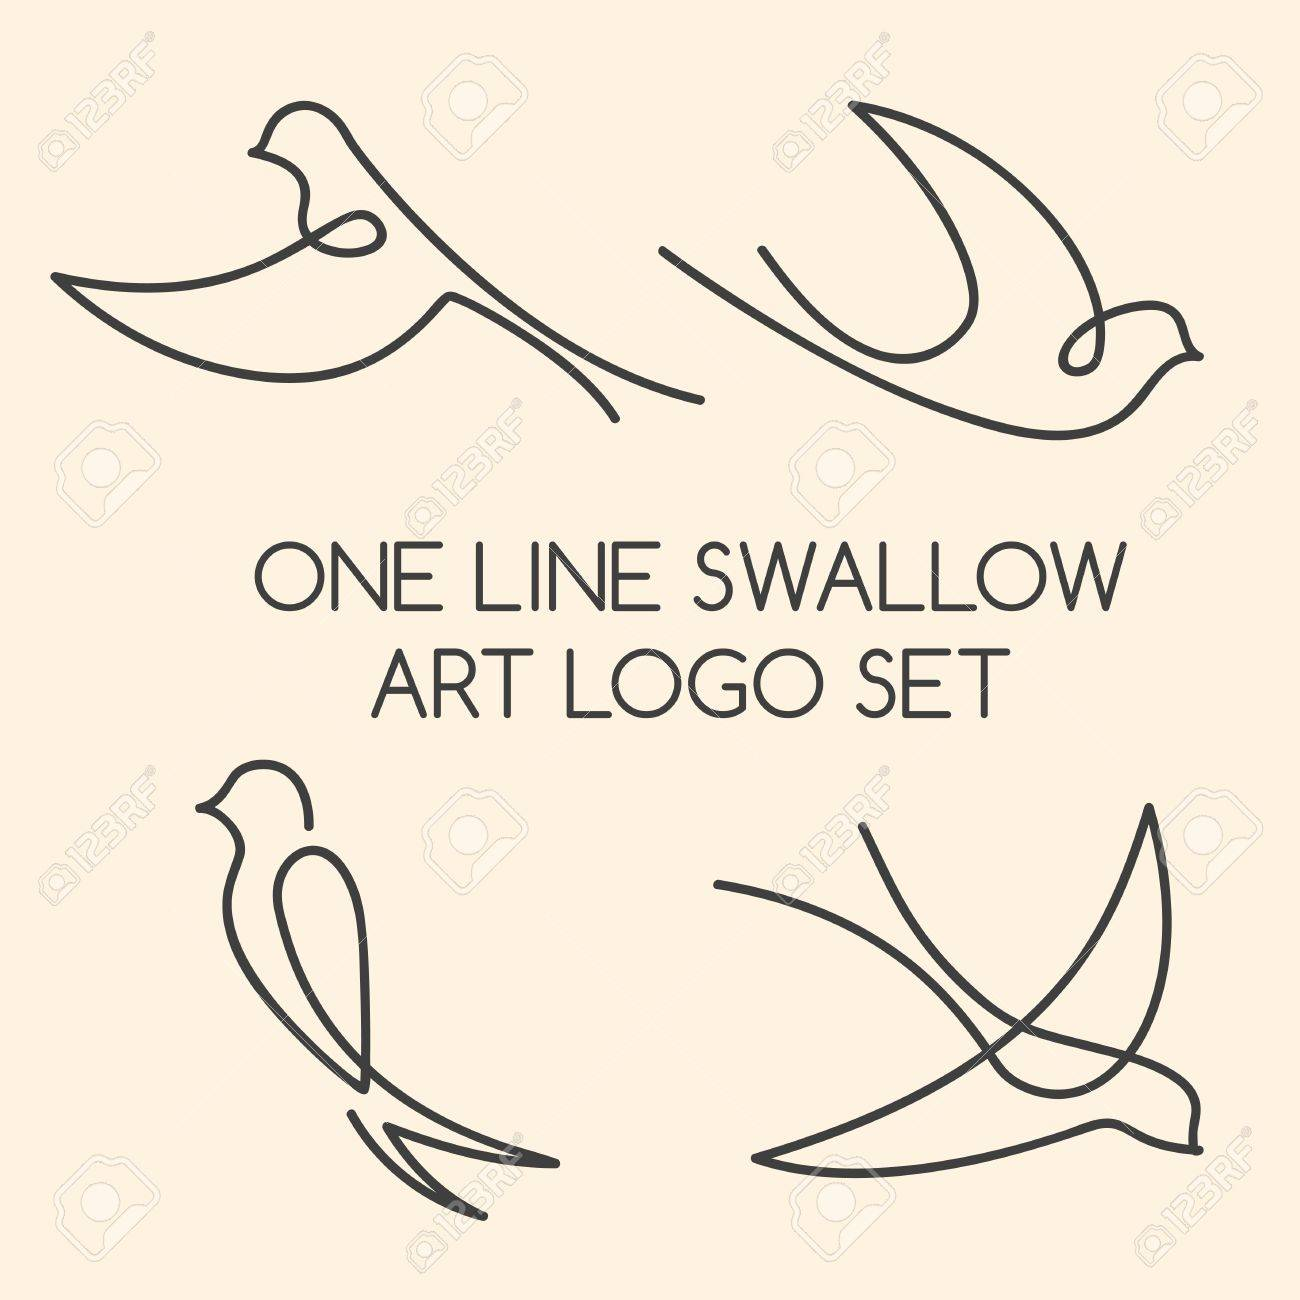 One line swallow art logo set - 51335587